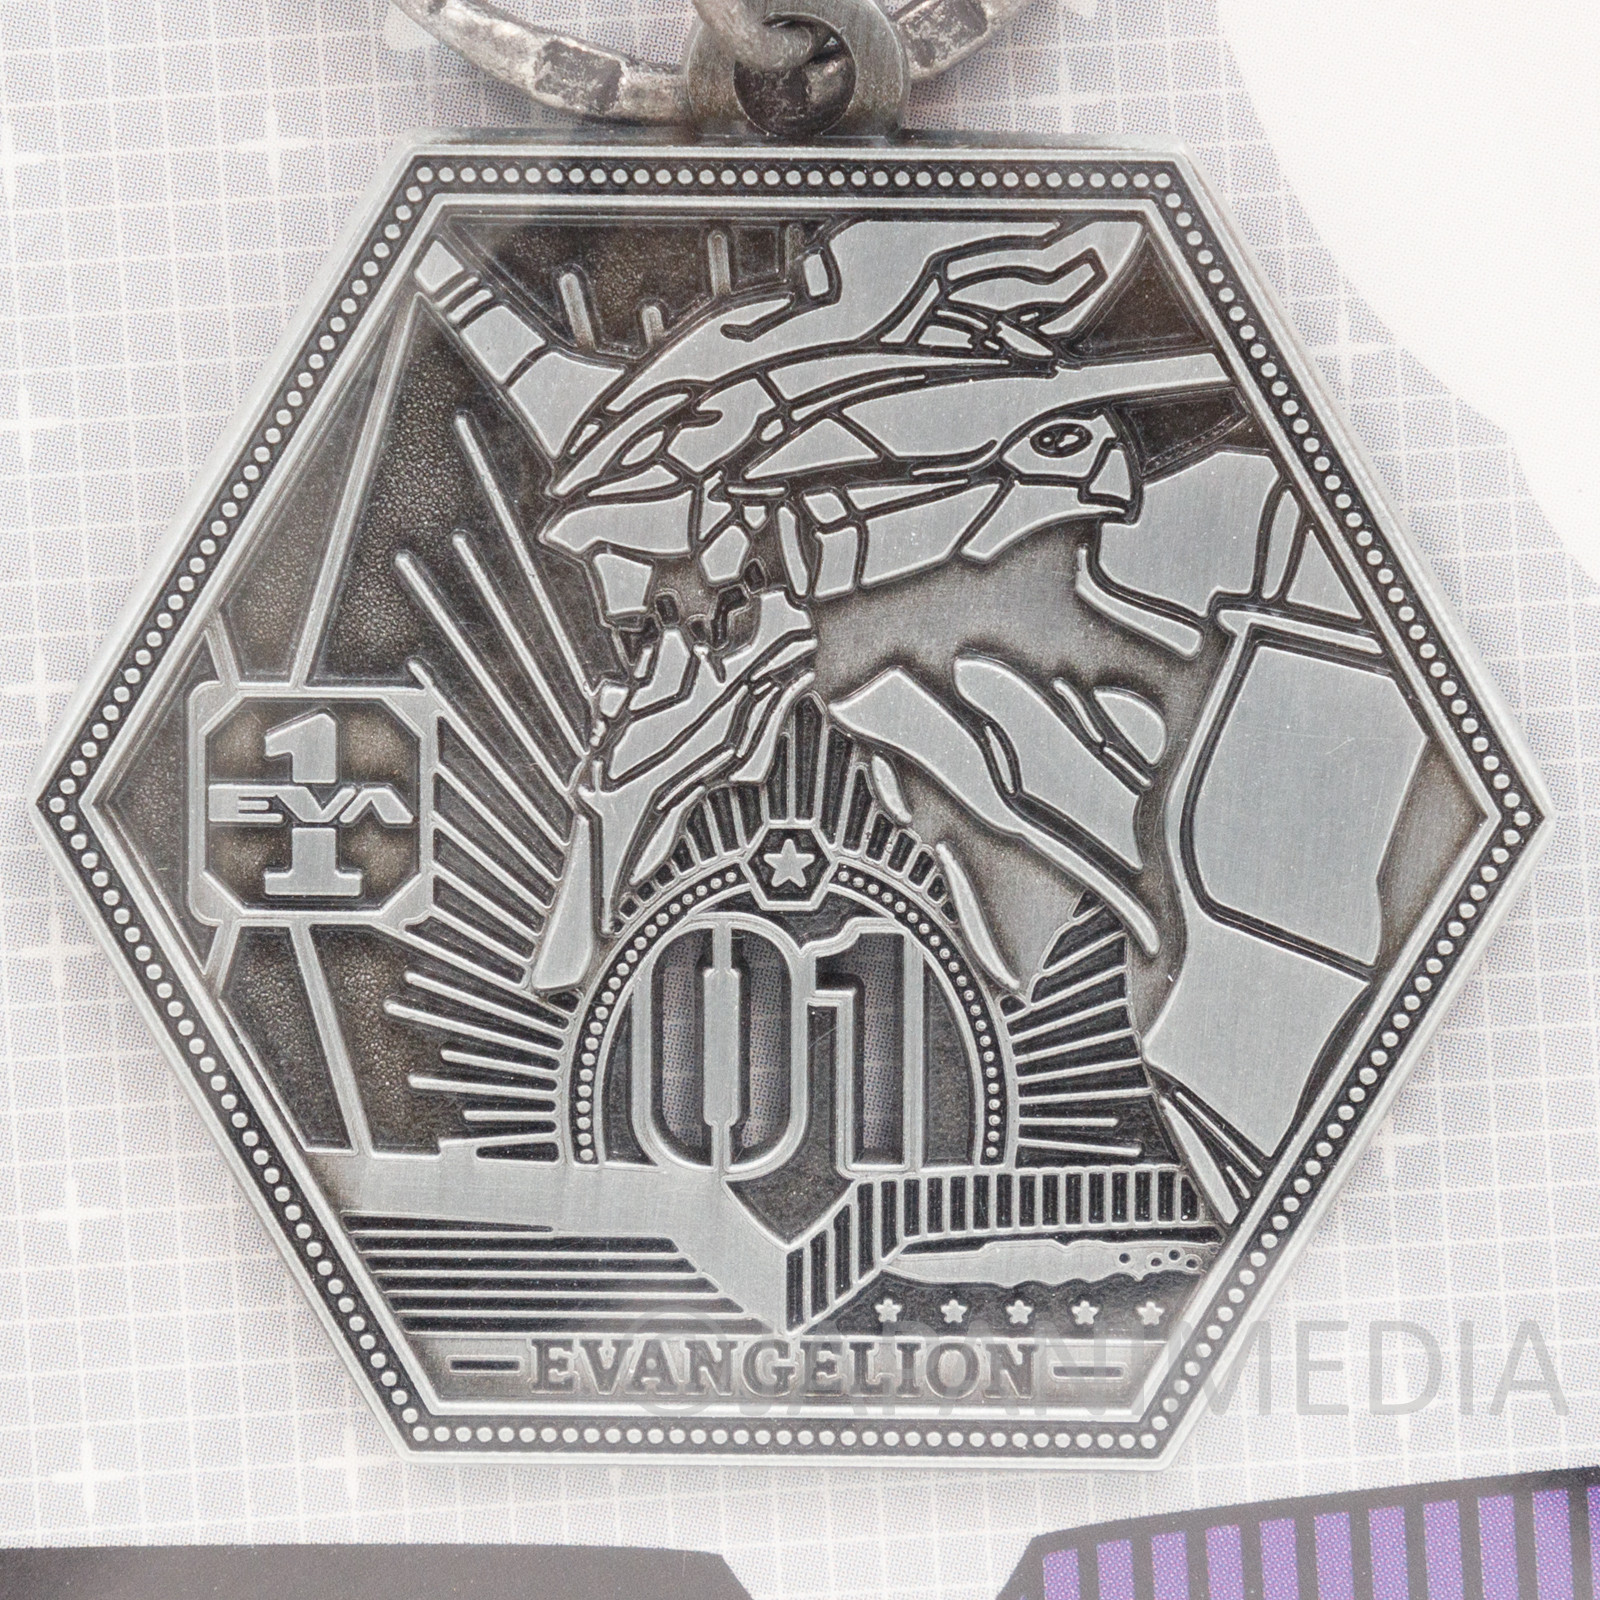 Evangelion EVA-01 Metal Charm Keychain JAPAN